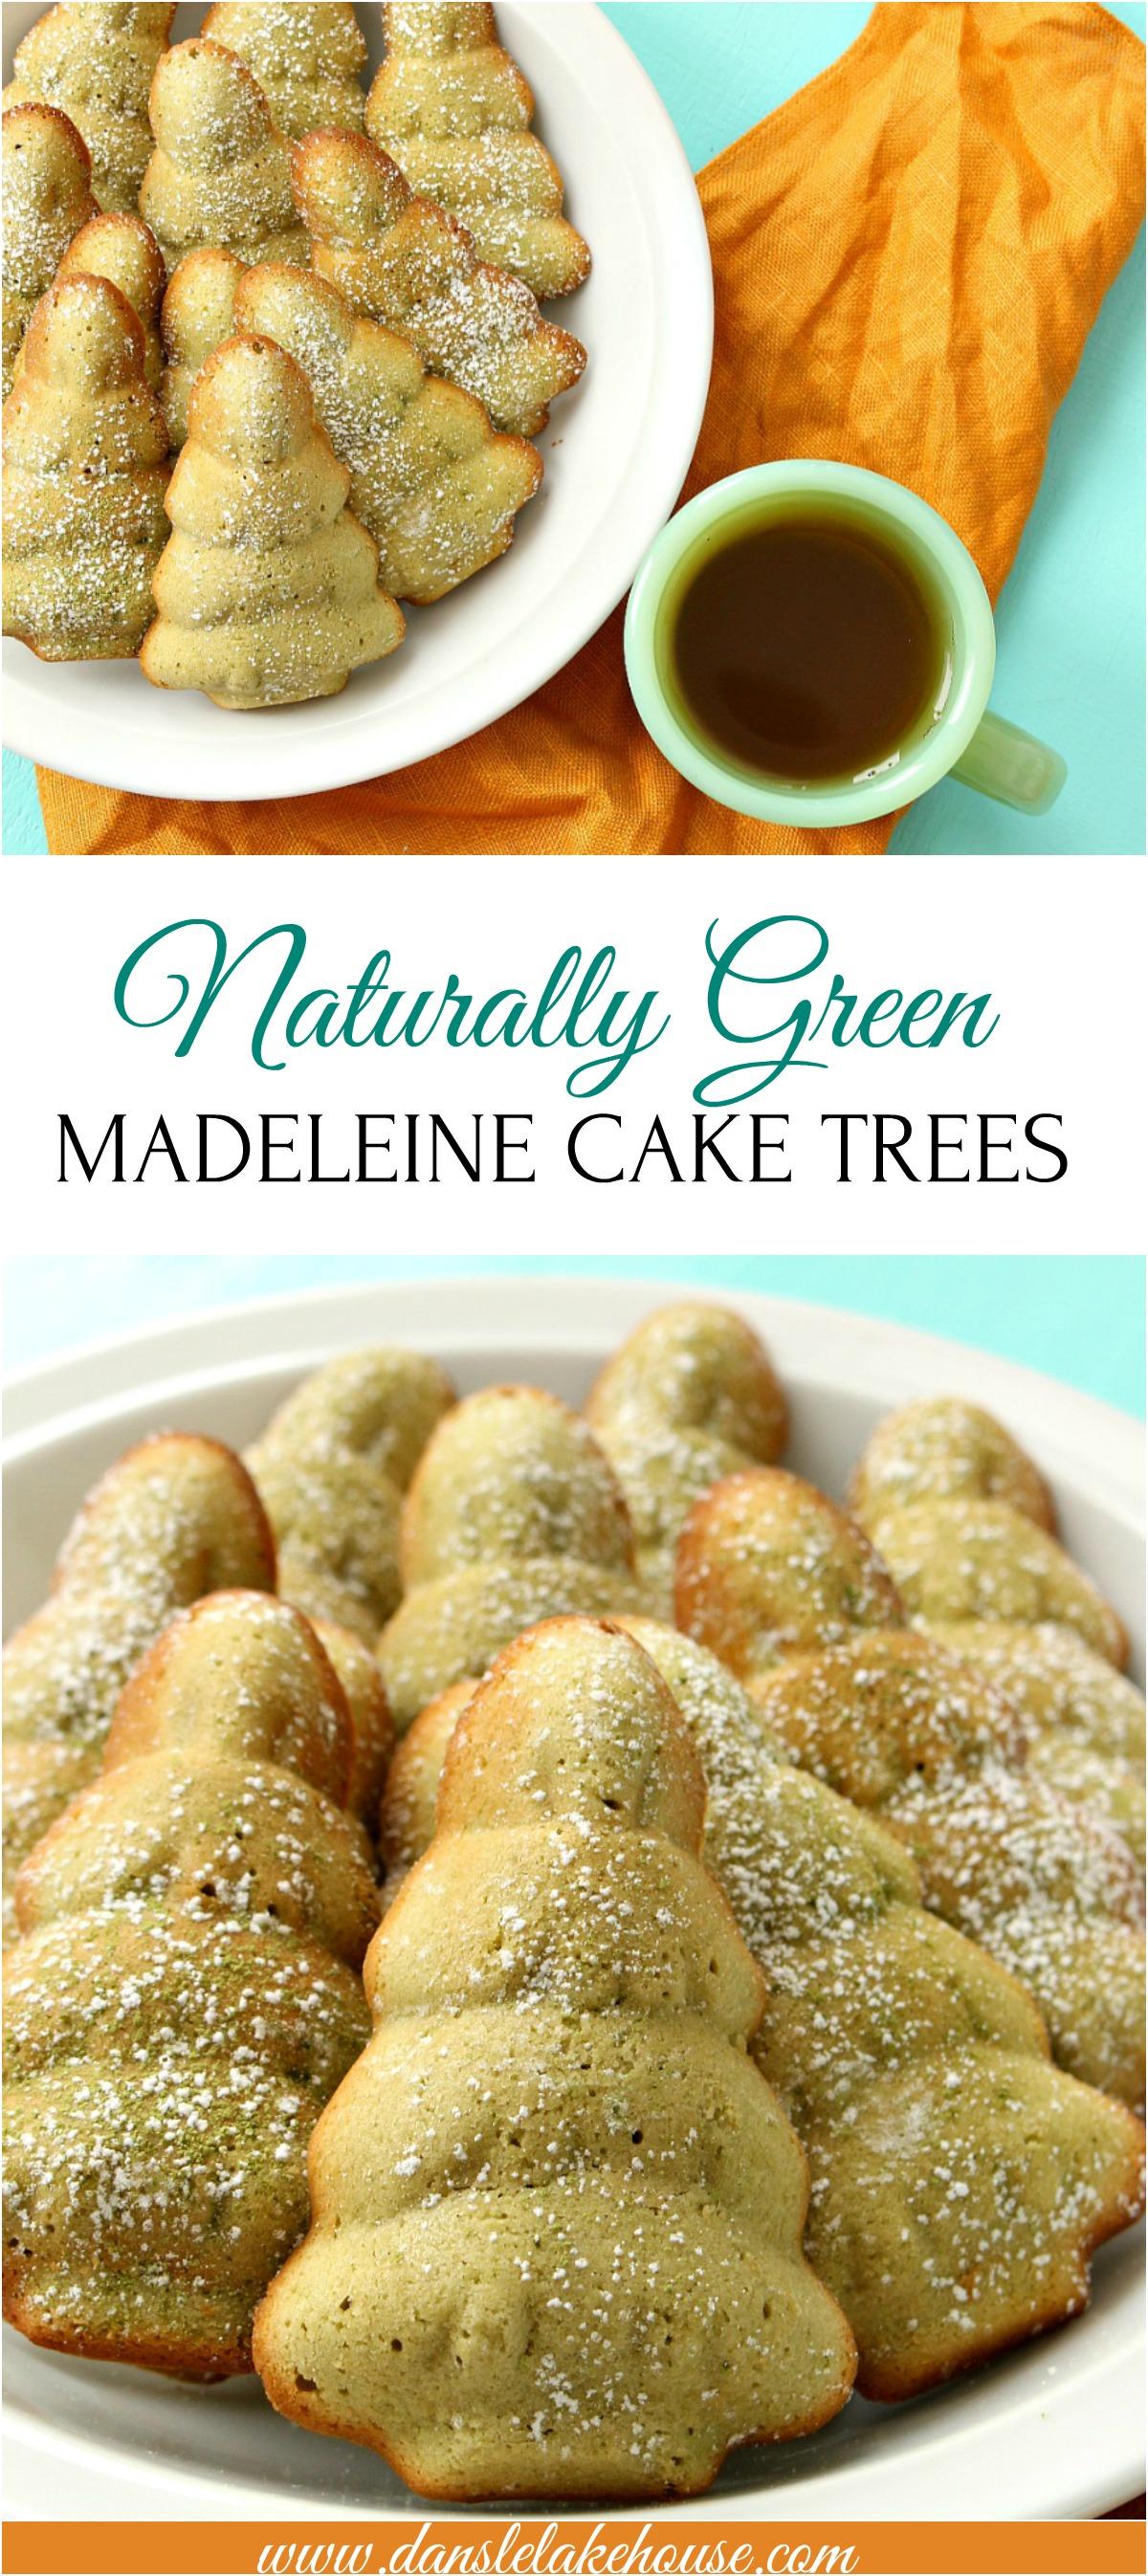 Naturally Green, Tree Shaped Matcha Madeleine Cakes